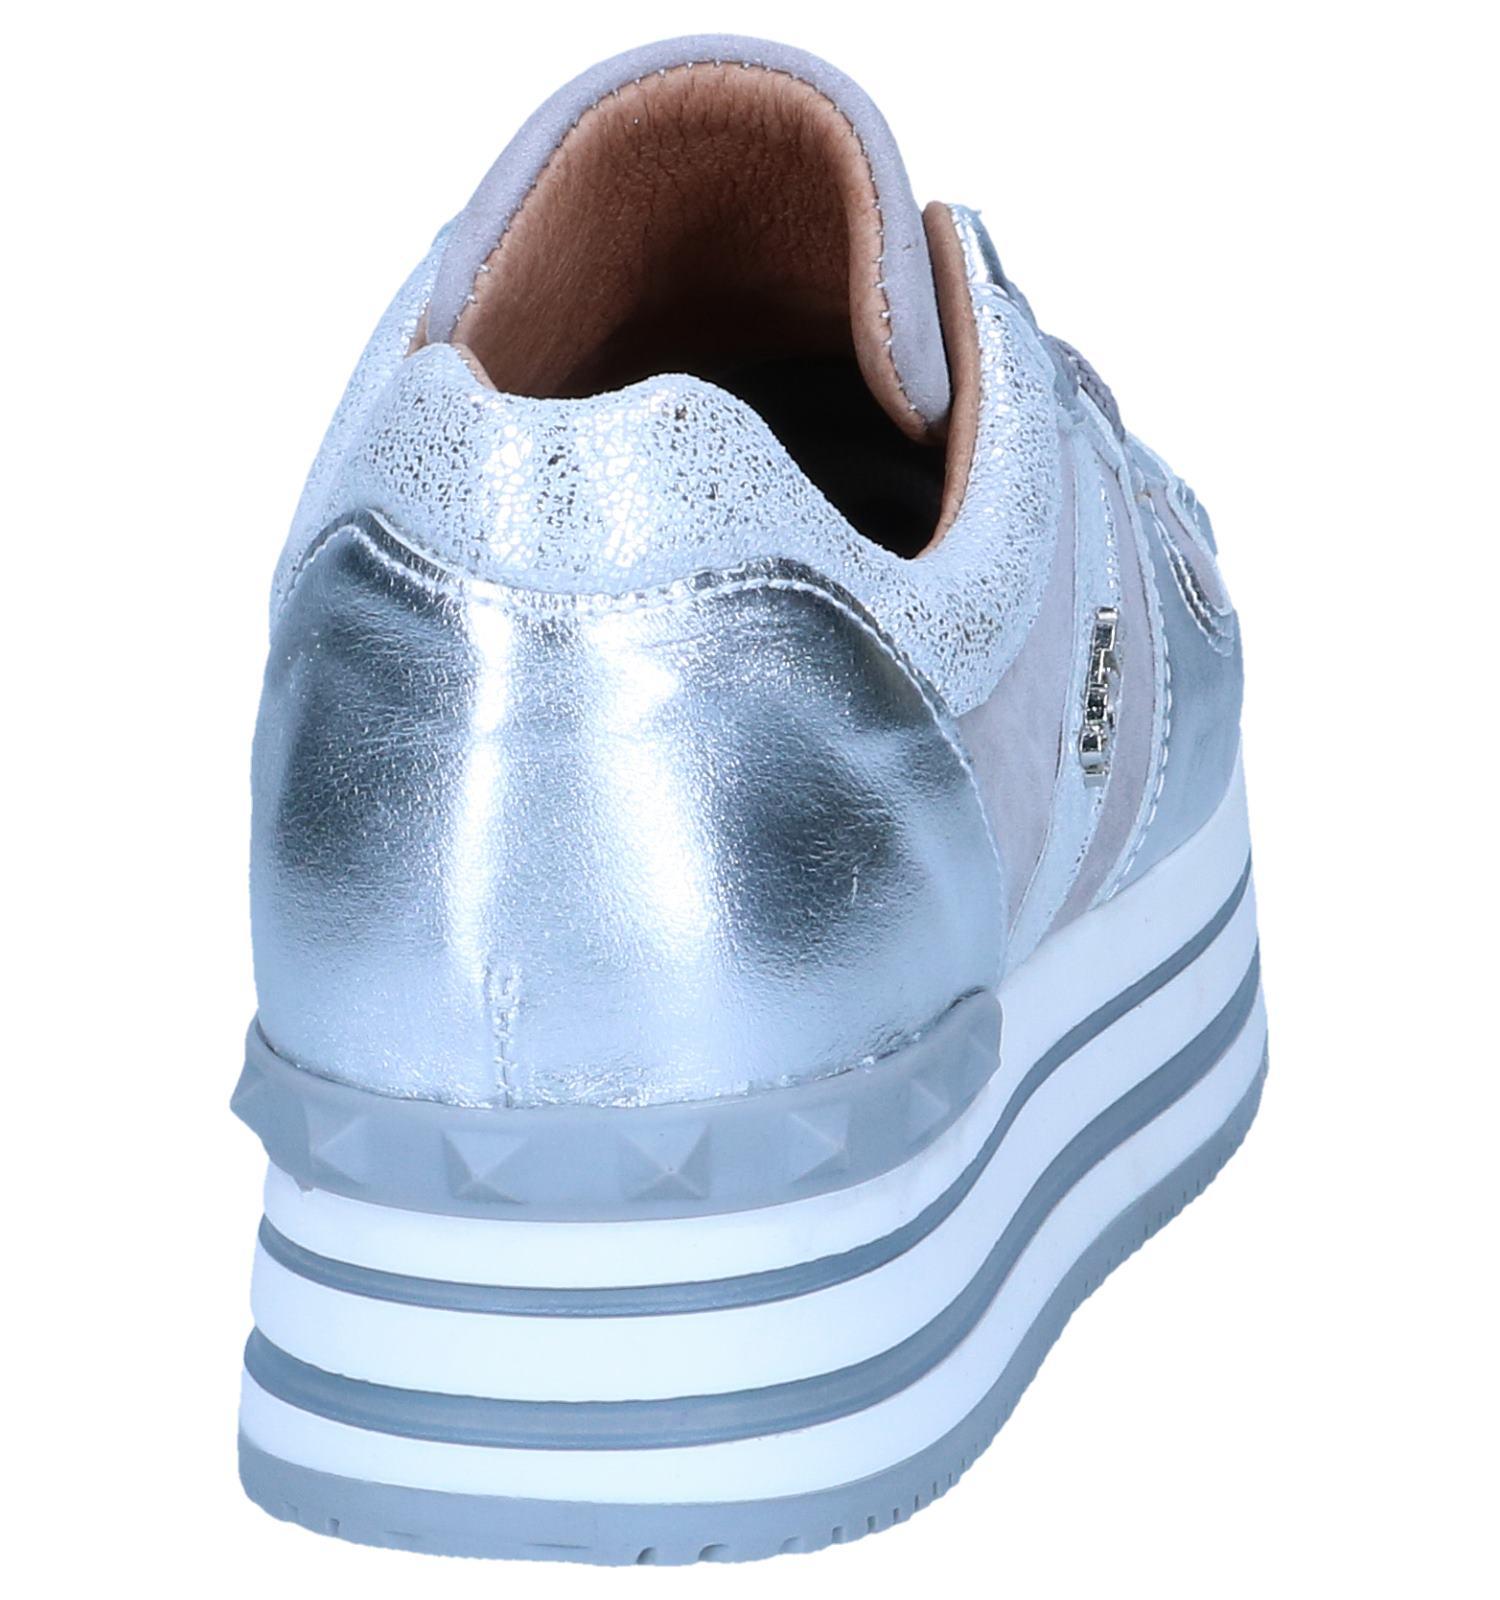 Scapa Scapa Zilveren Sneakers Scapa Zilveren Sneakers Sneakers Zilveren Sneakers Zilveren trQdsh